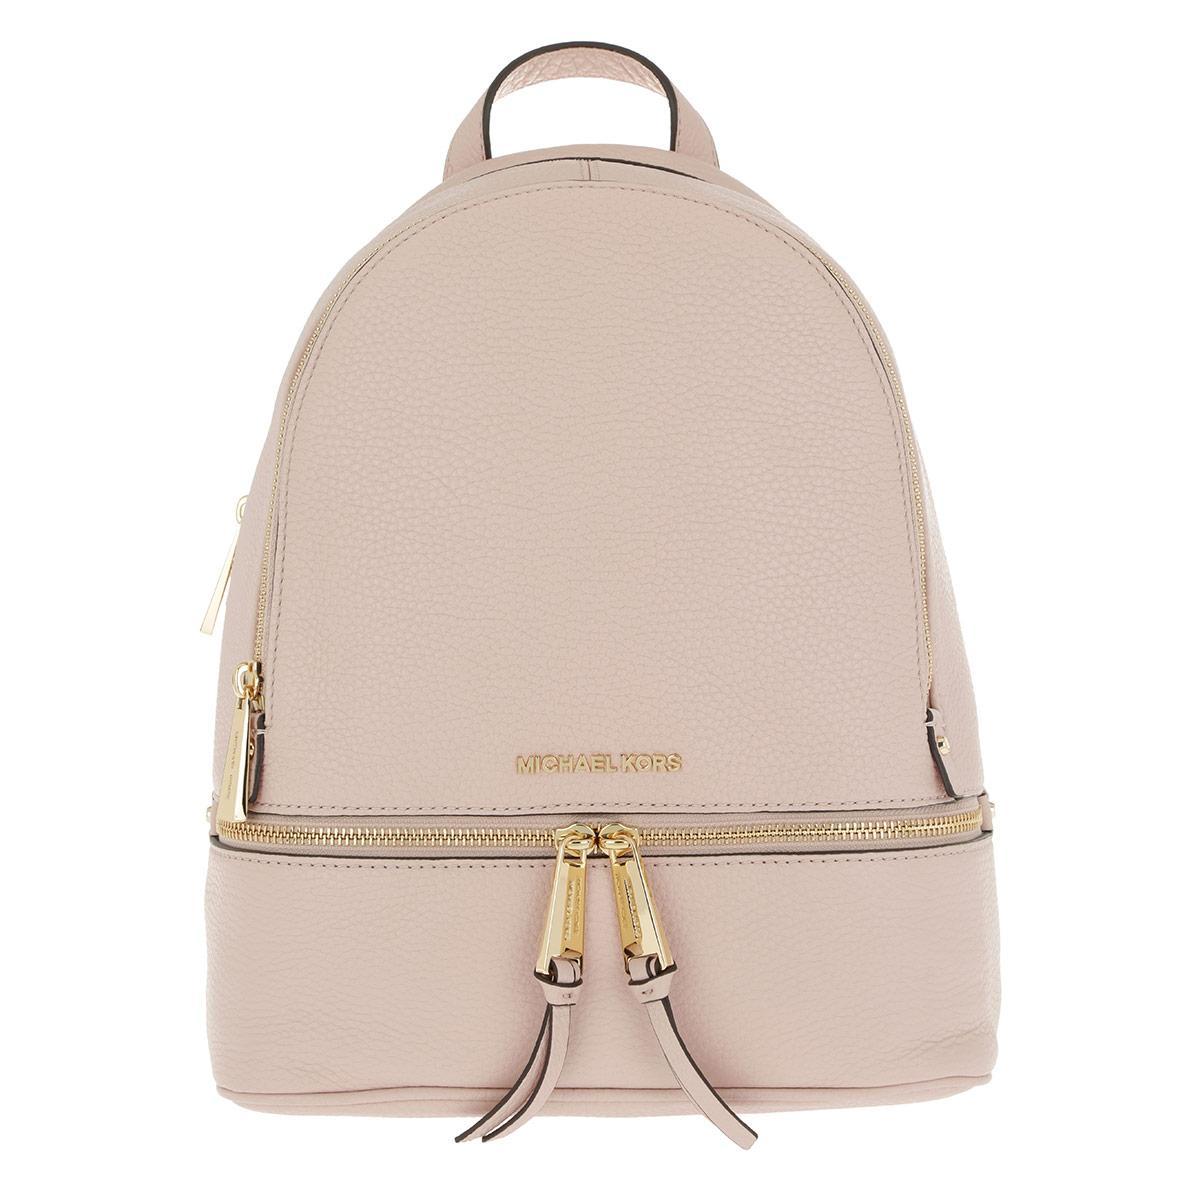 ce3733205597 Michael Kors - Rhea Zip Medium Backpack Soft Pink - Lyst. View fullscreen